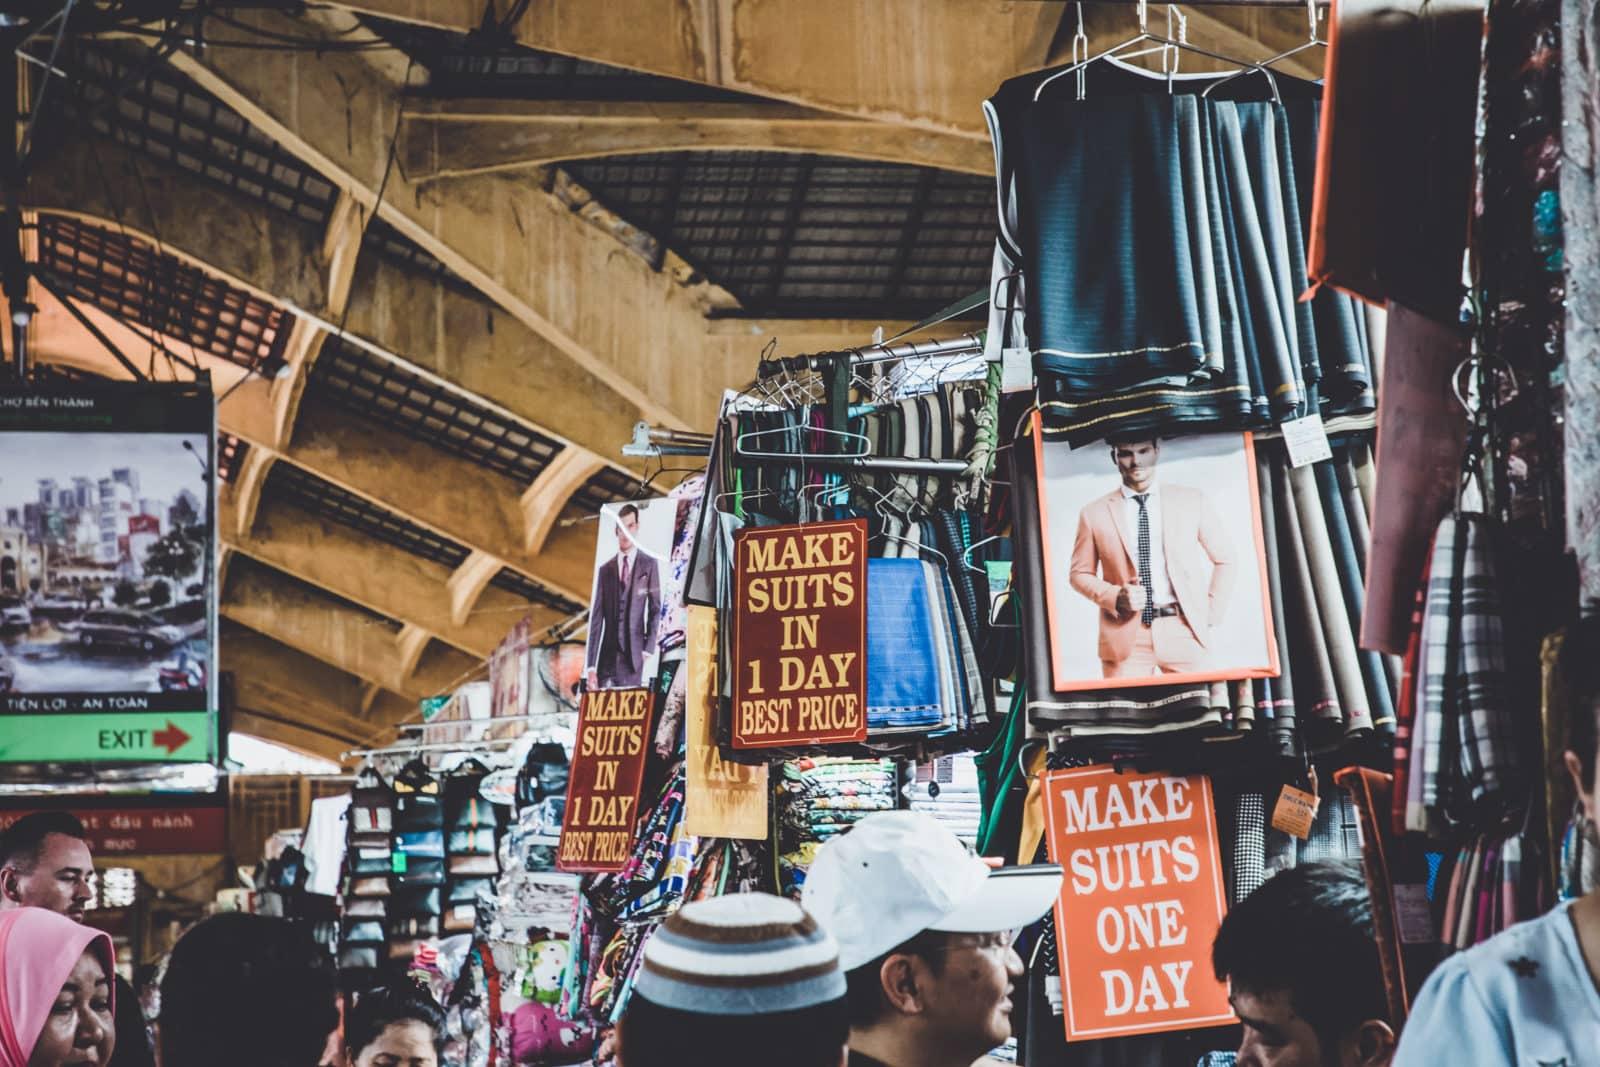 Make Suits in One Day Best Price Vietnam